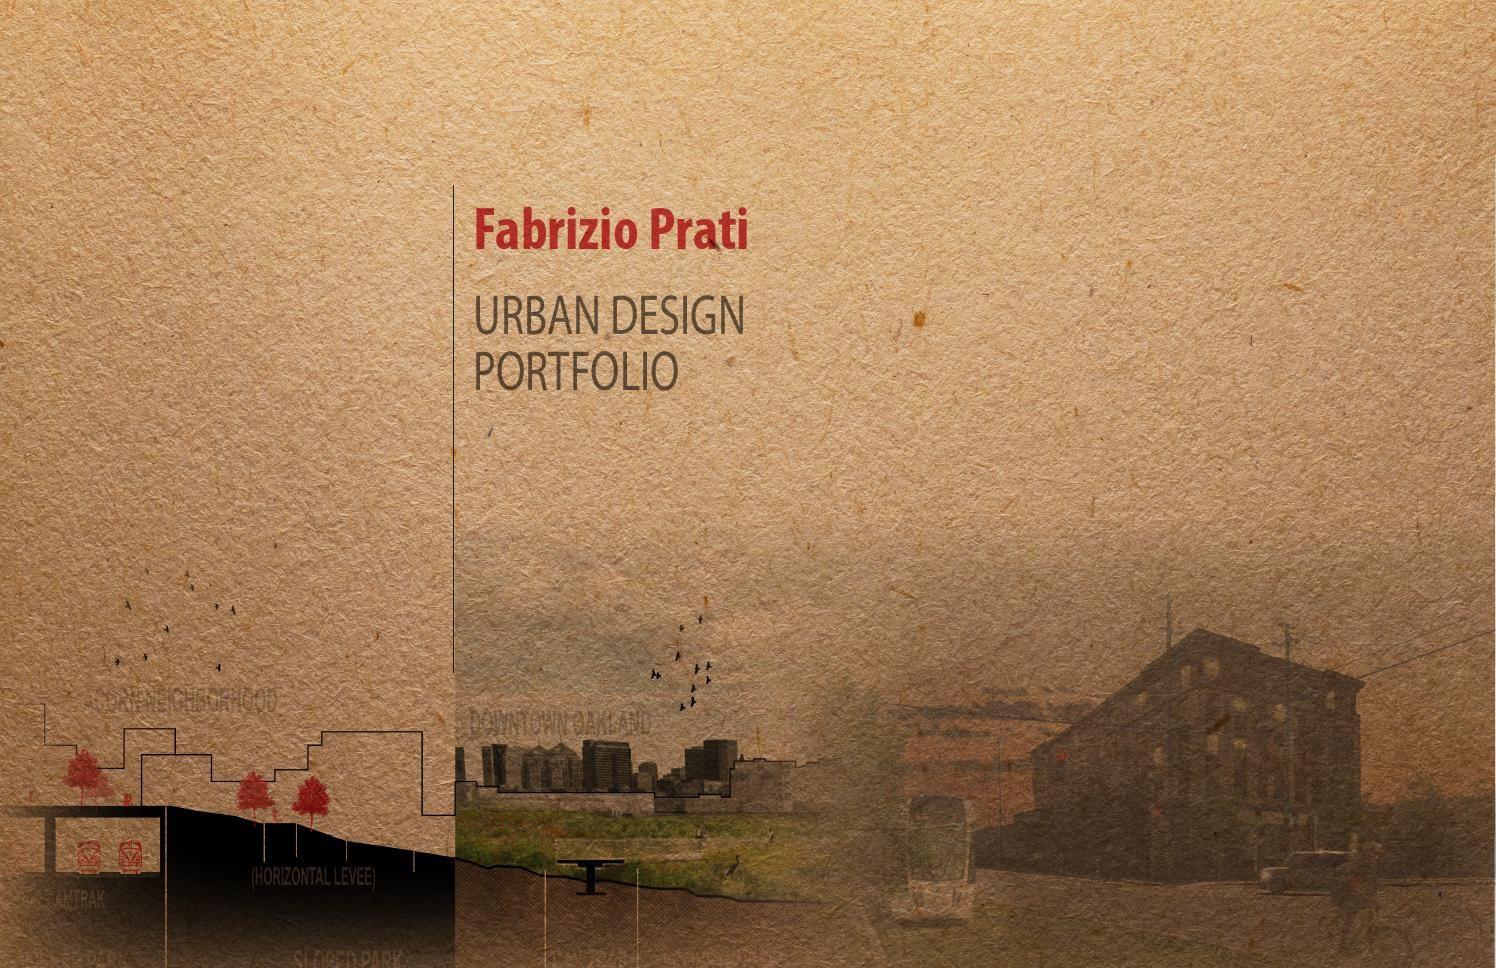 urban design portfolio 2013 2014 urban design design portfolios